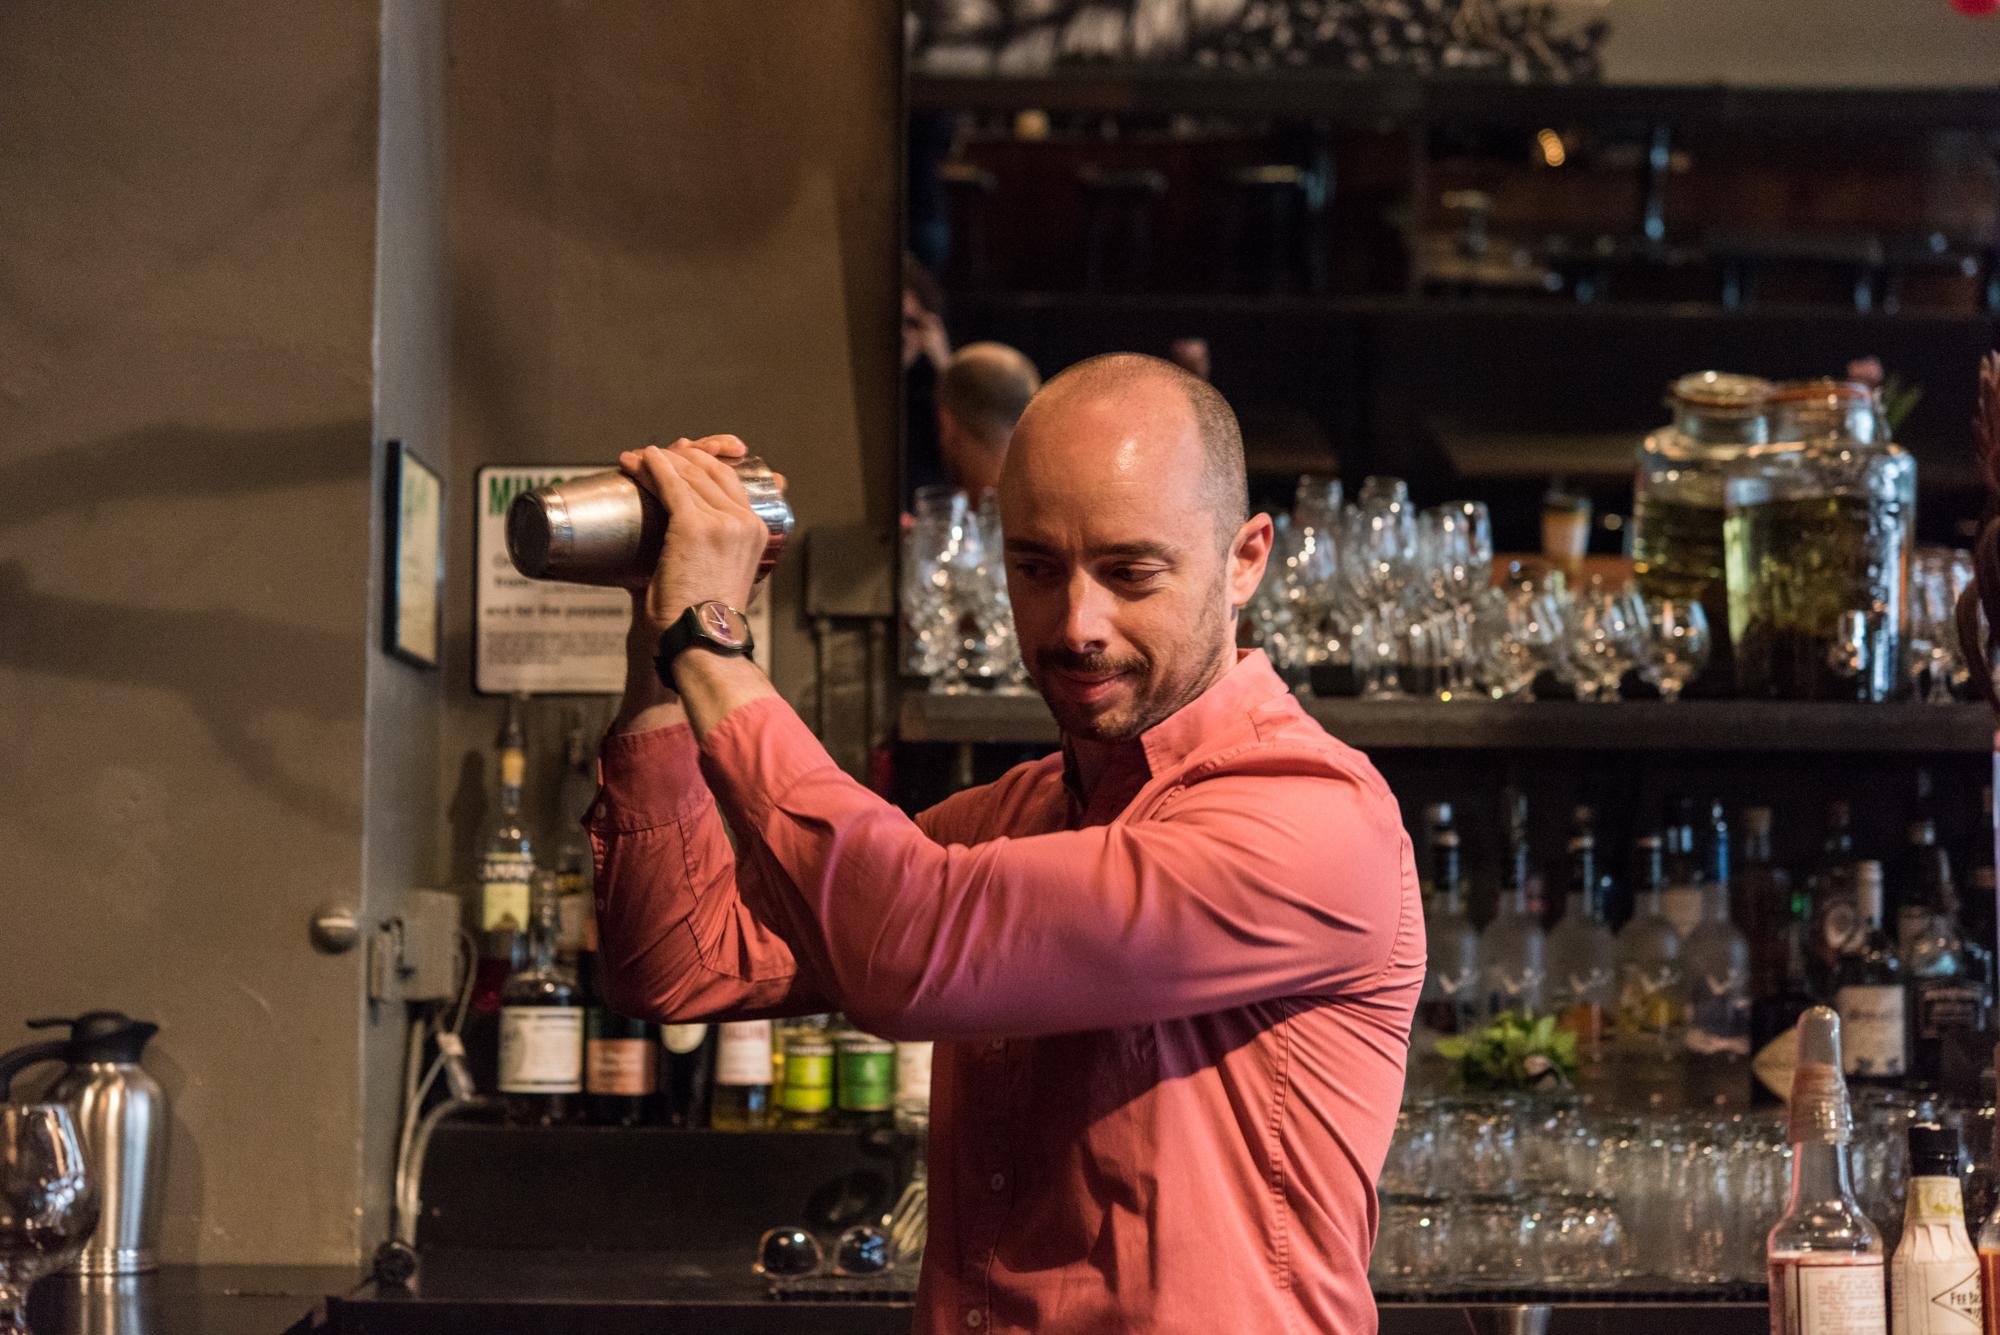 Lead bartender at Saucebox David Estes